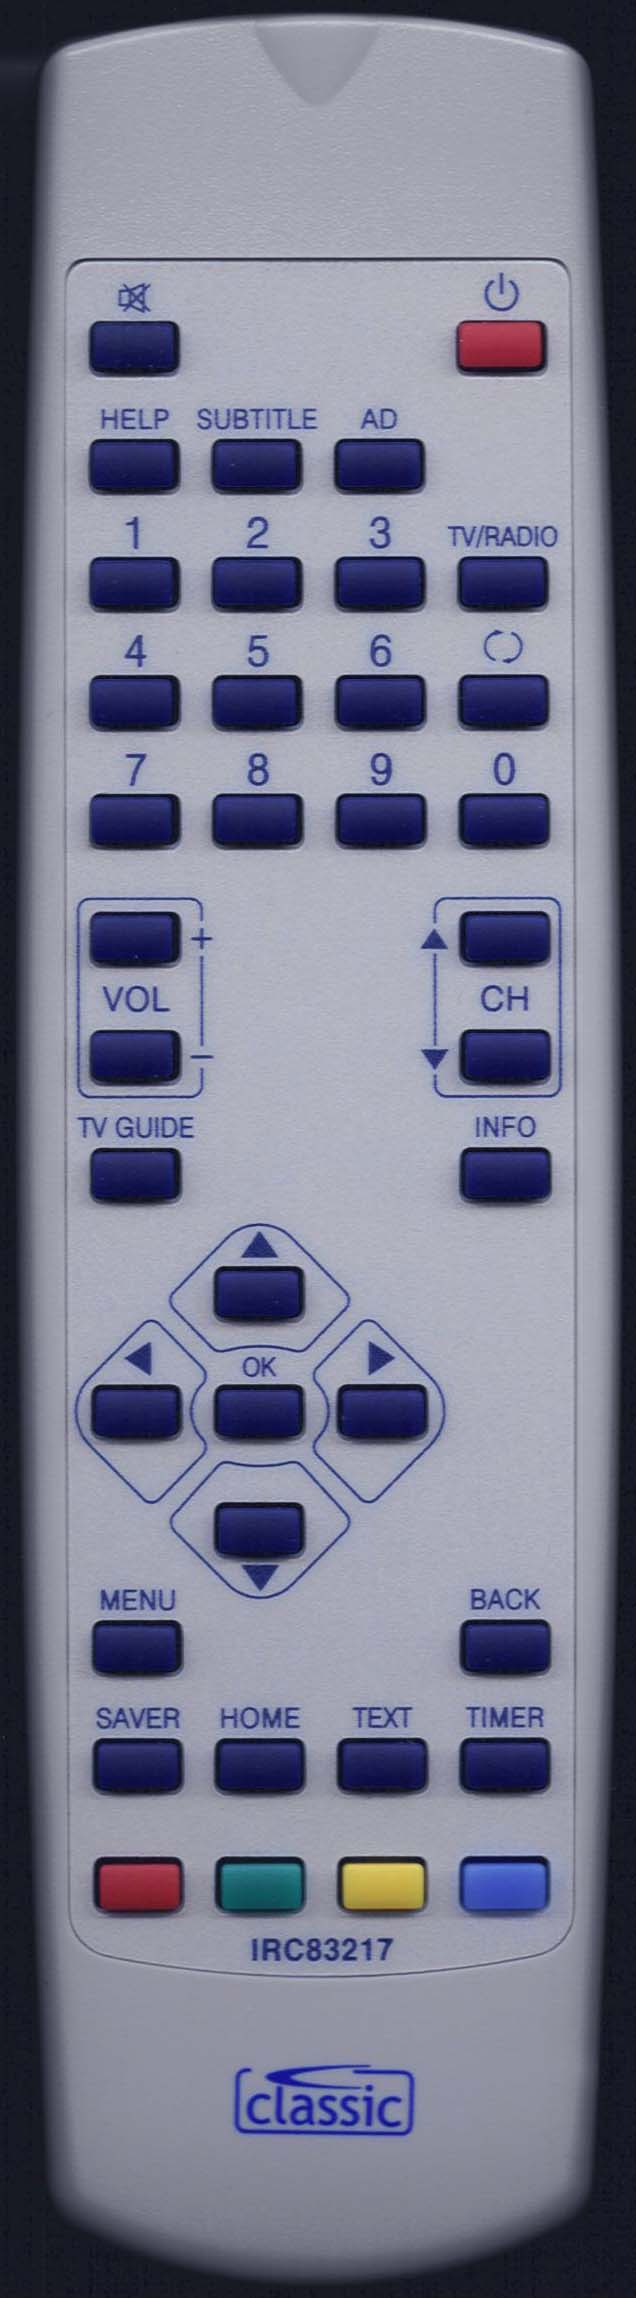 TVONICS MFR-300 Replacement Remote Control